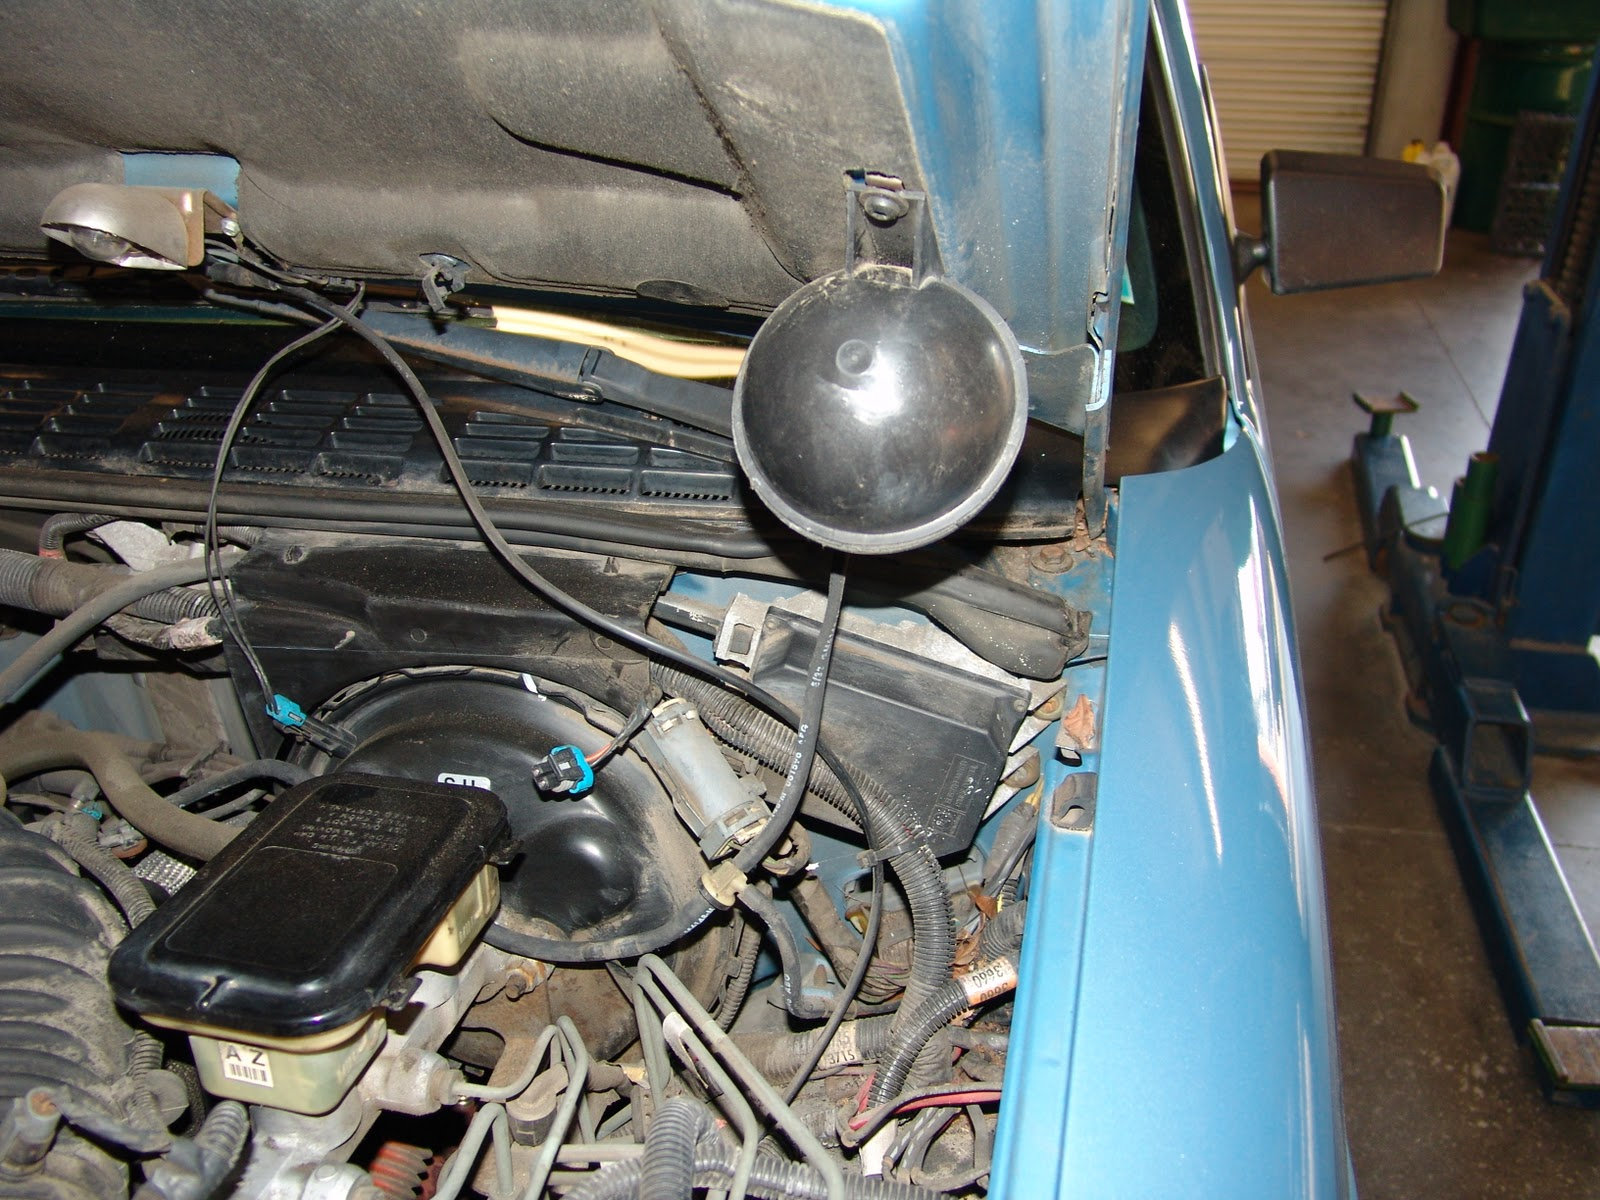 2003 Accord Trailer Wiring Harness 97 Blazer 4x4 Help Needed With Pic Blazer Forum Chevy